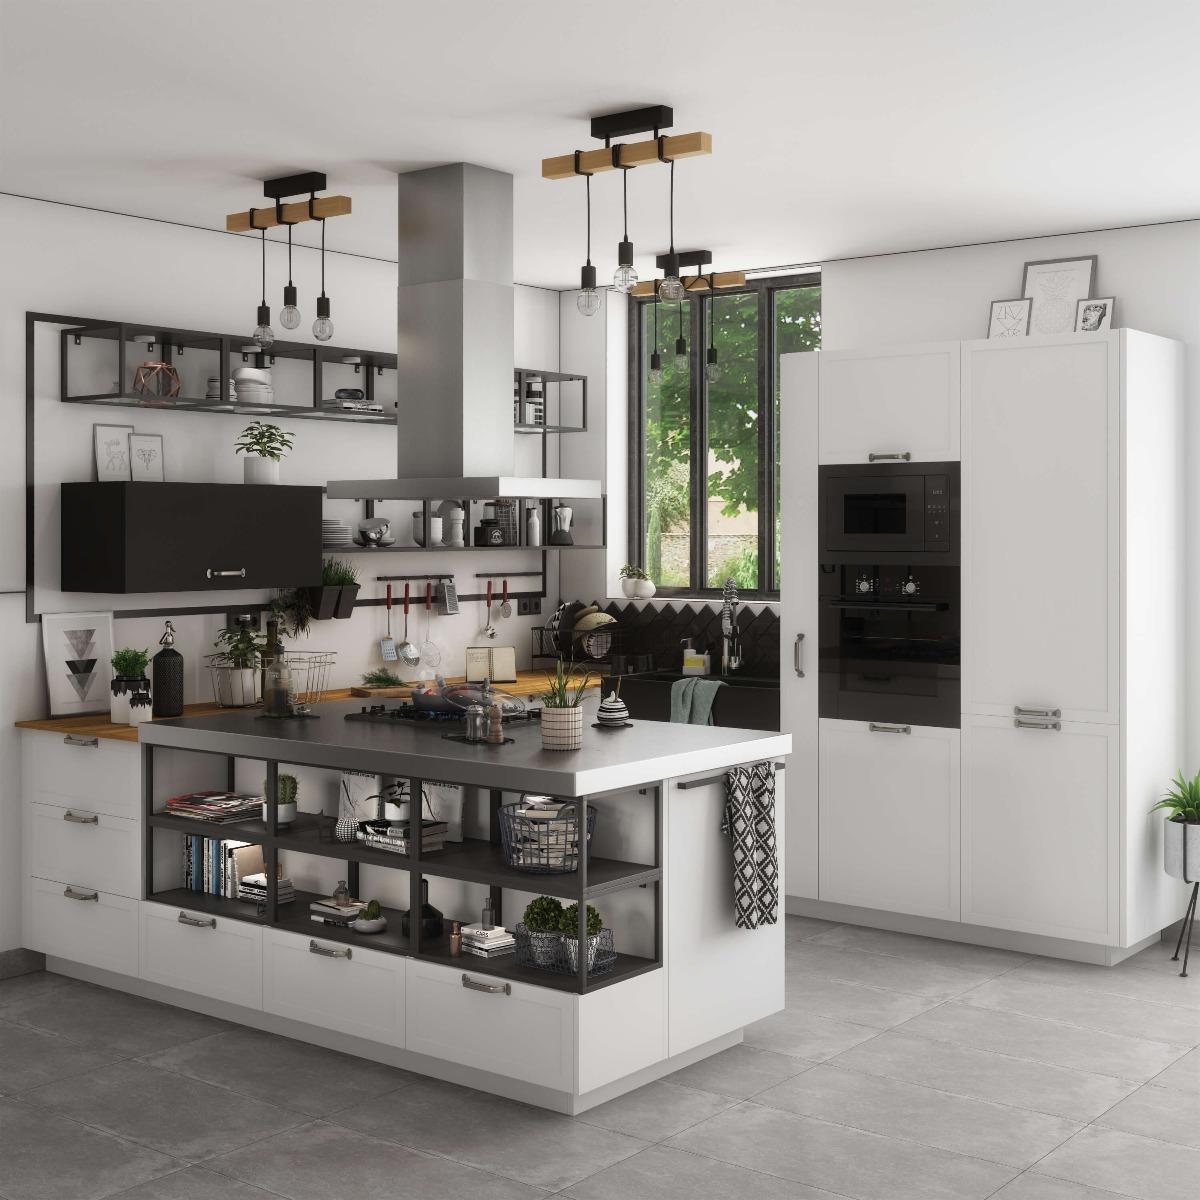 Delinia Newport White Designer Kitchen By Leroy Merlin Leroy Merlin South Africa